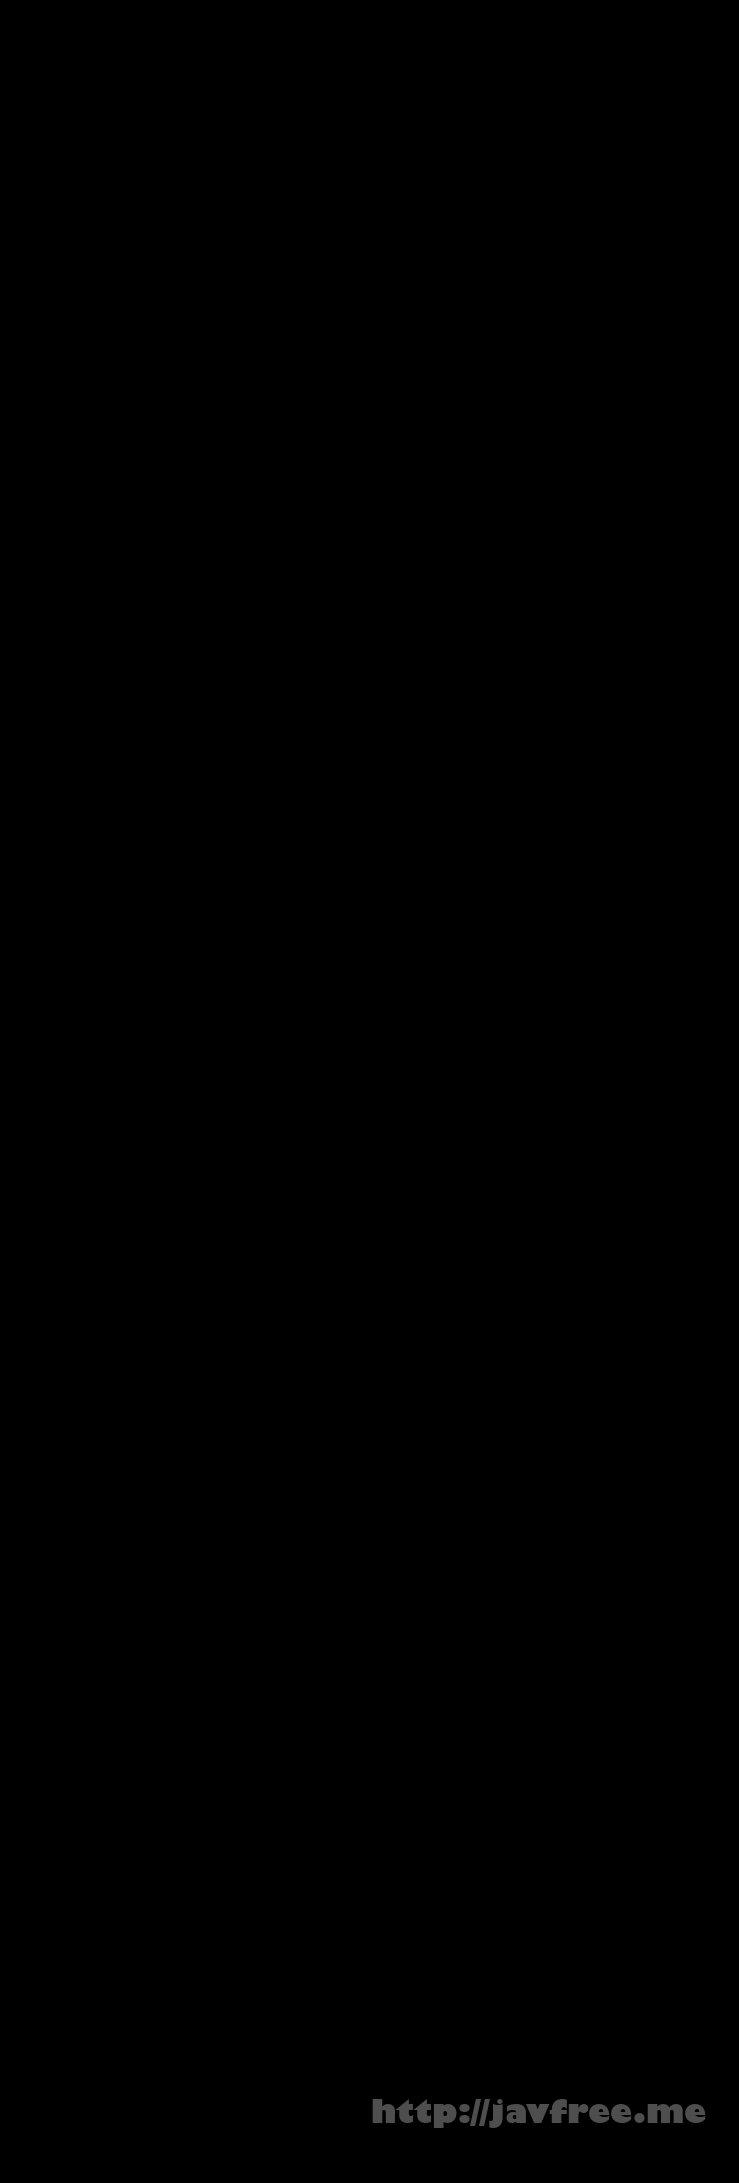 [MIGD-627] 中出し専用肉便器 小西まりえ - image MIGD-627 on https://javfree.me